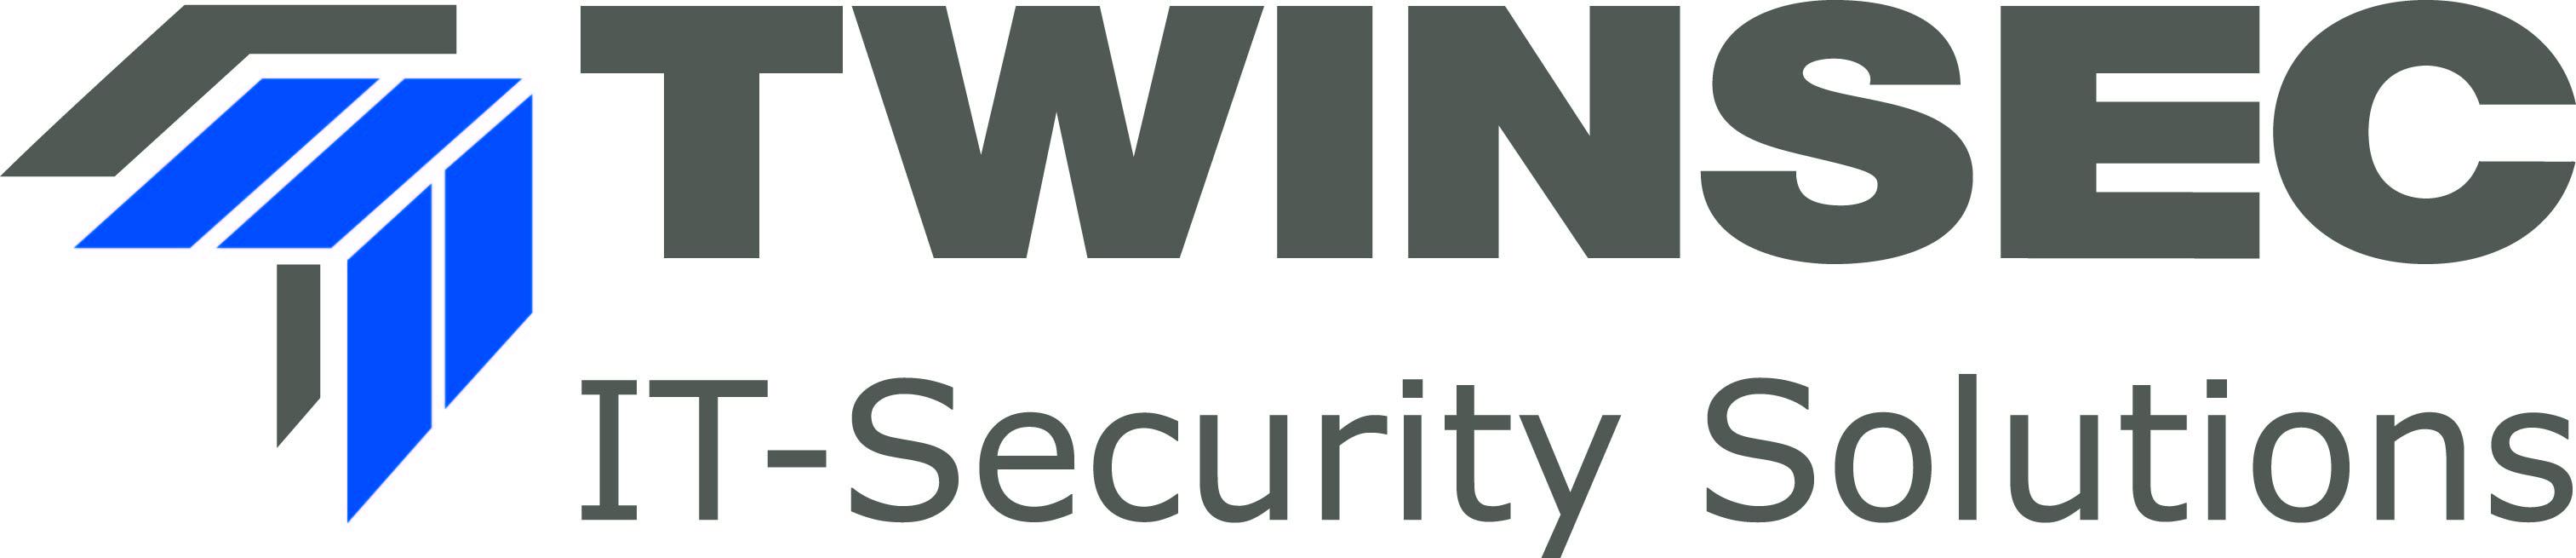 twinsec-logo